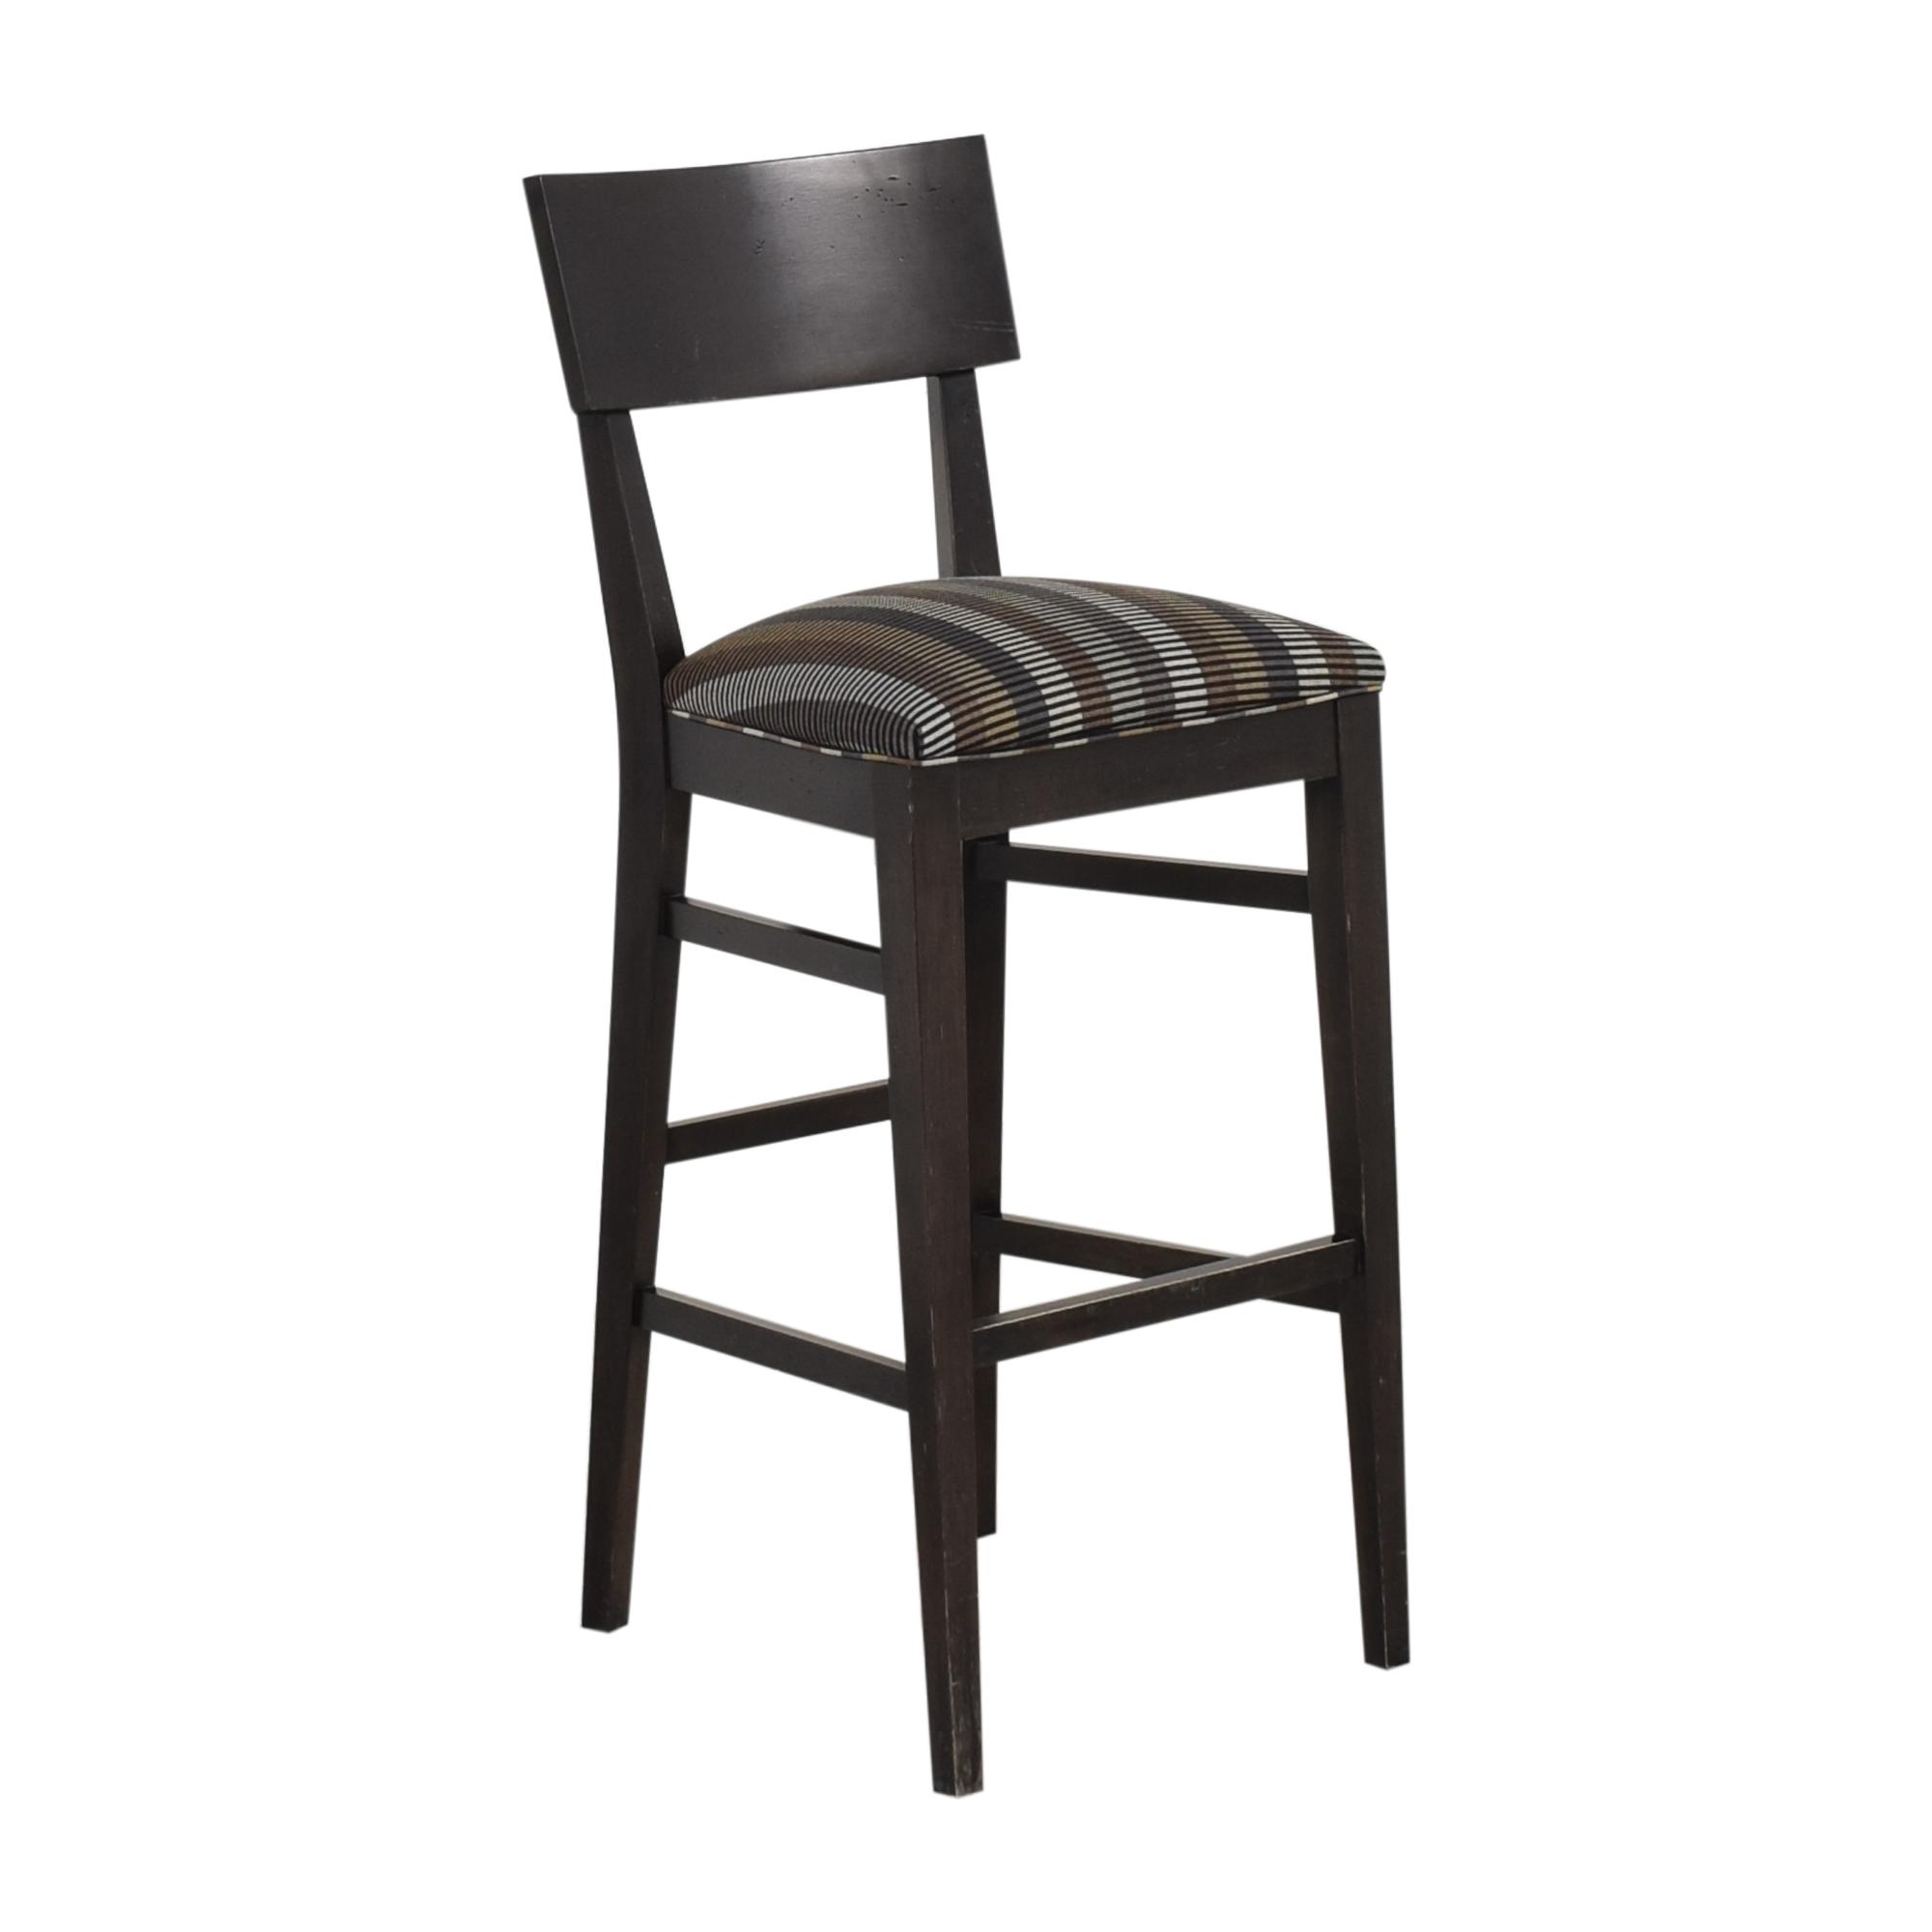 Ethan Allen Ethan Allen Impressions Bar Stool Chairs